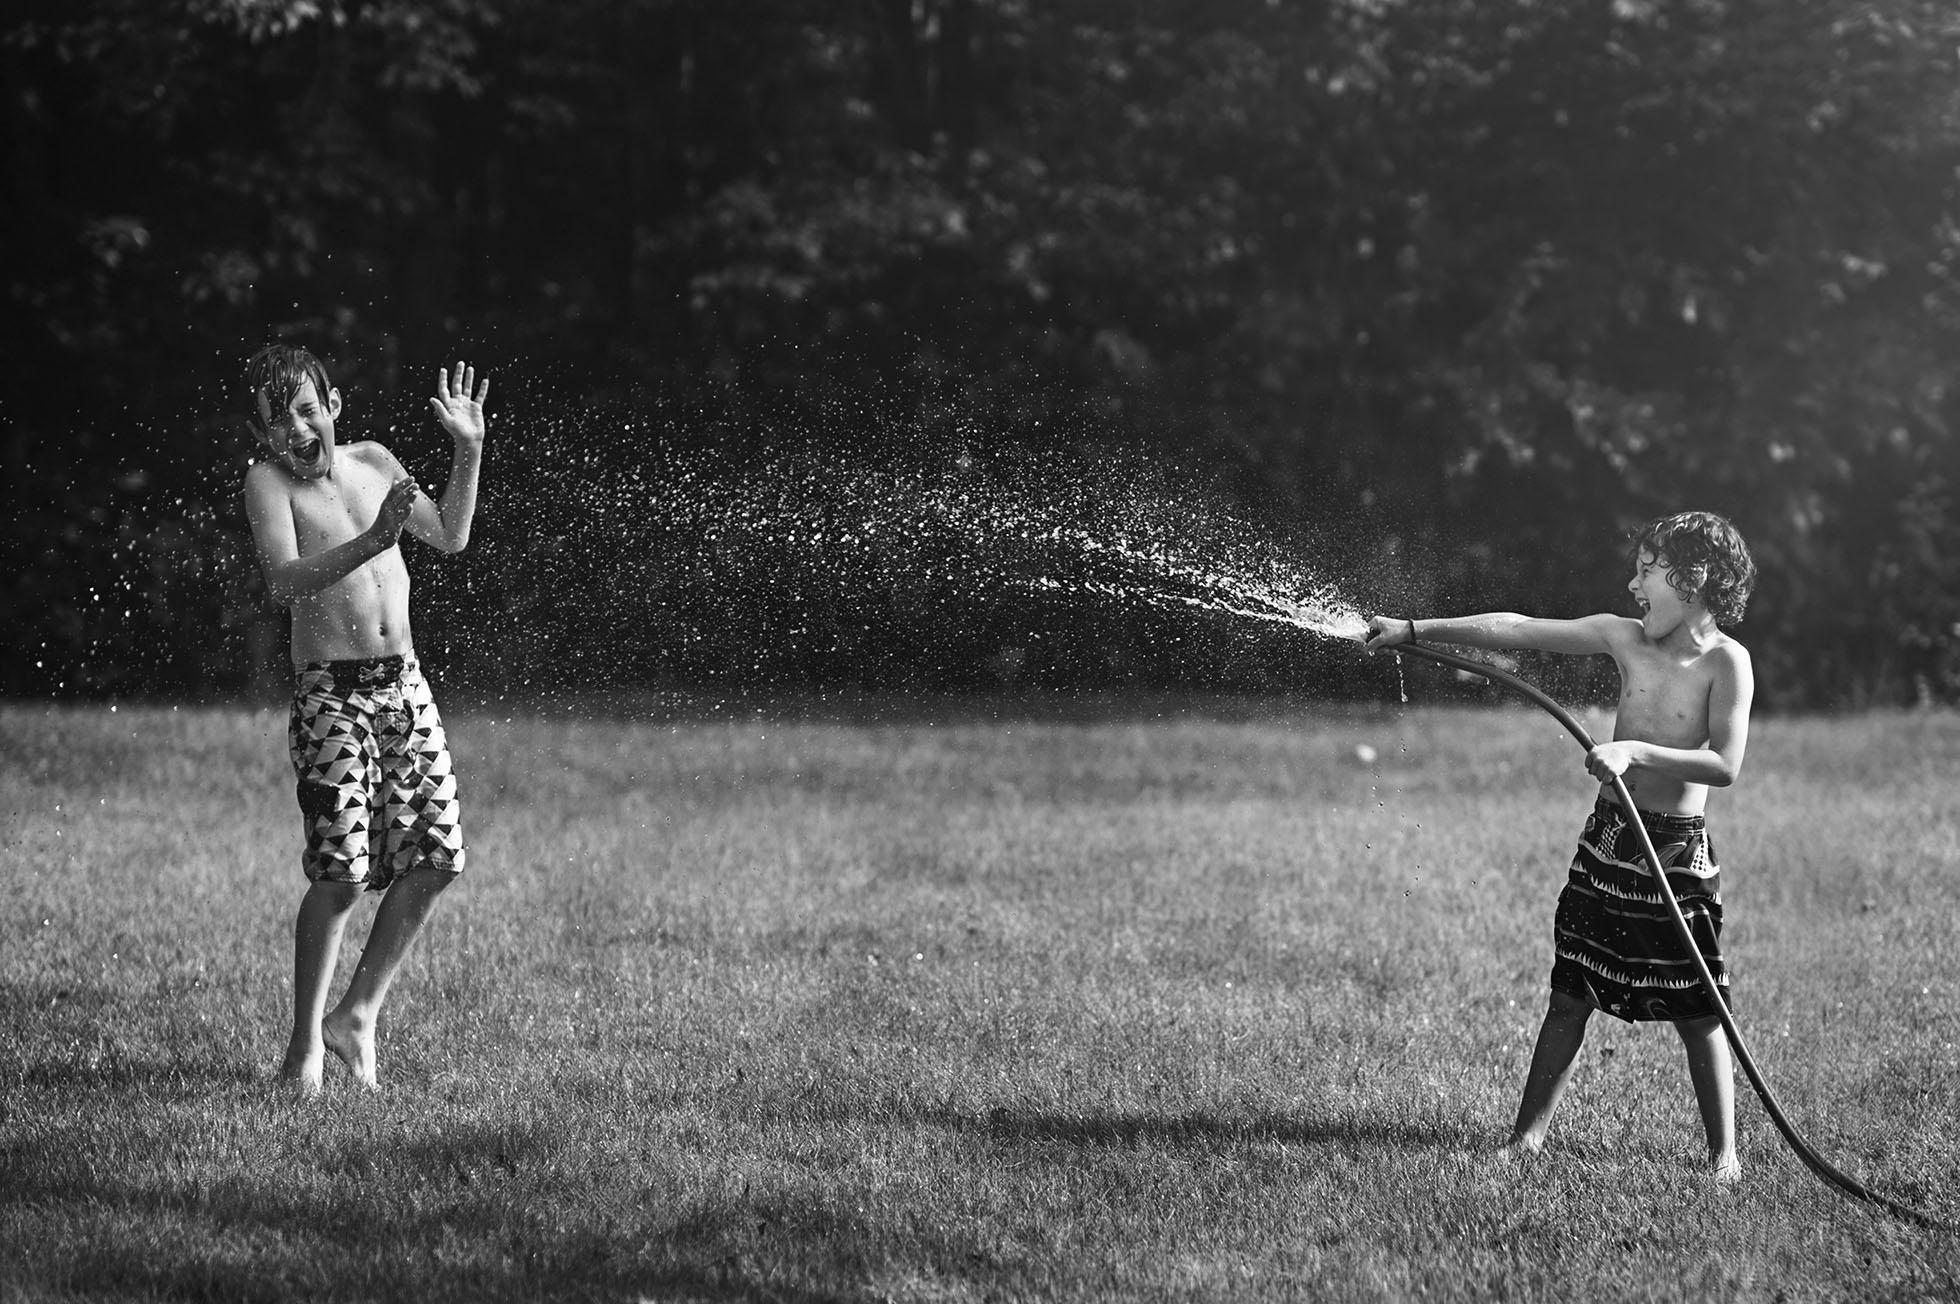 boy spraying brother with hose freezing motion kellie bieser